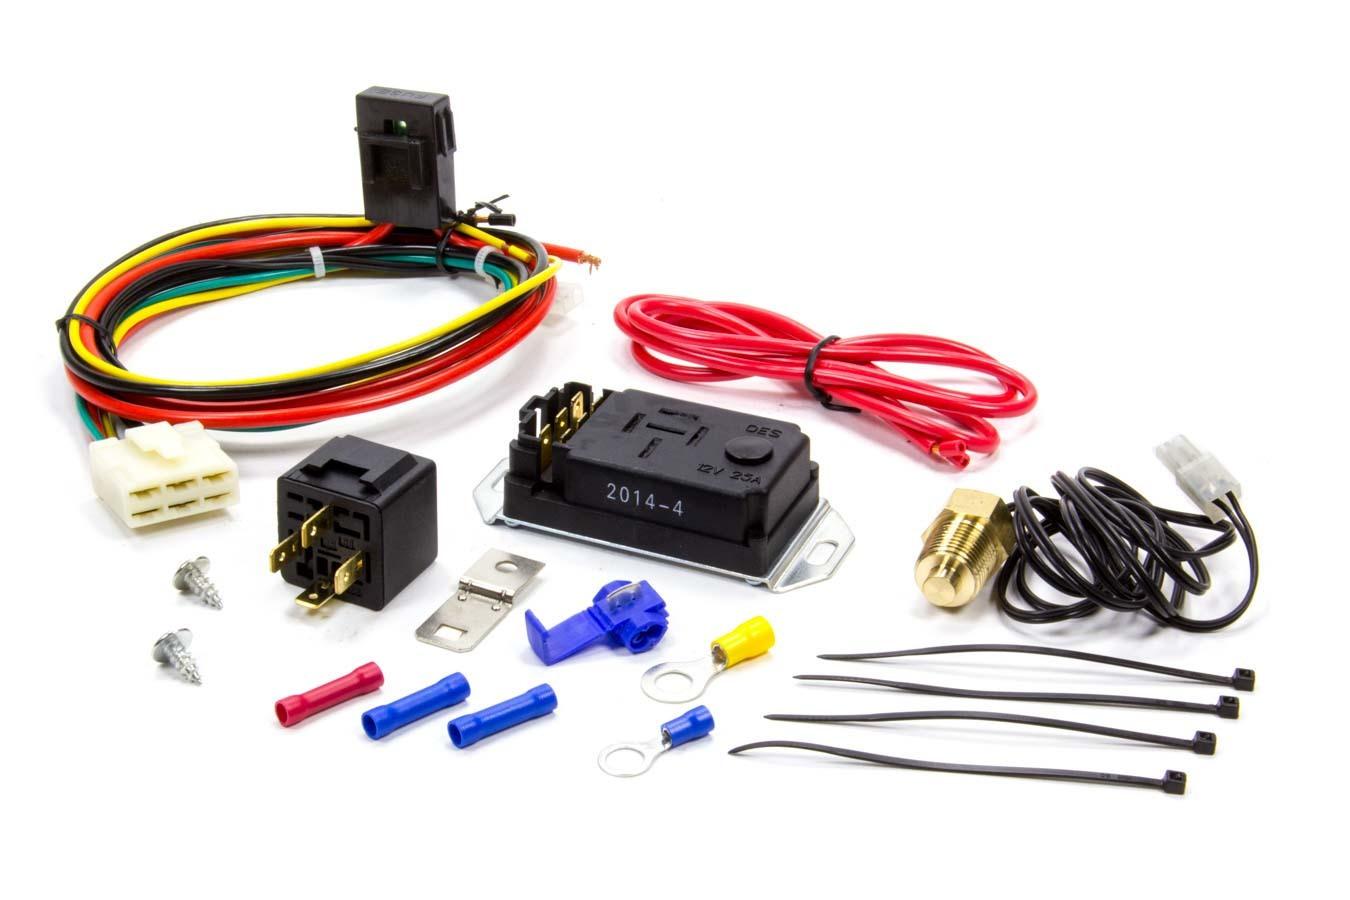 Proform Adjustable Electric Fan Controller Thread-In Prb